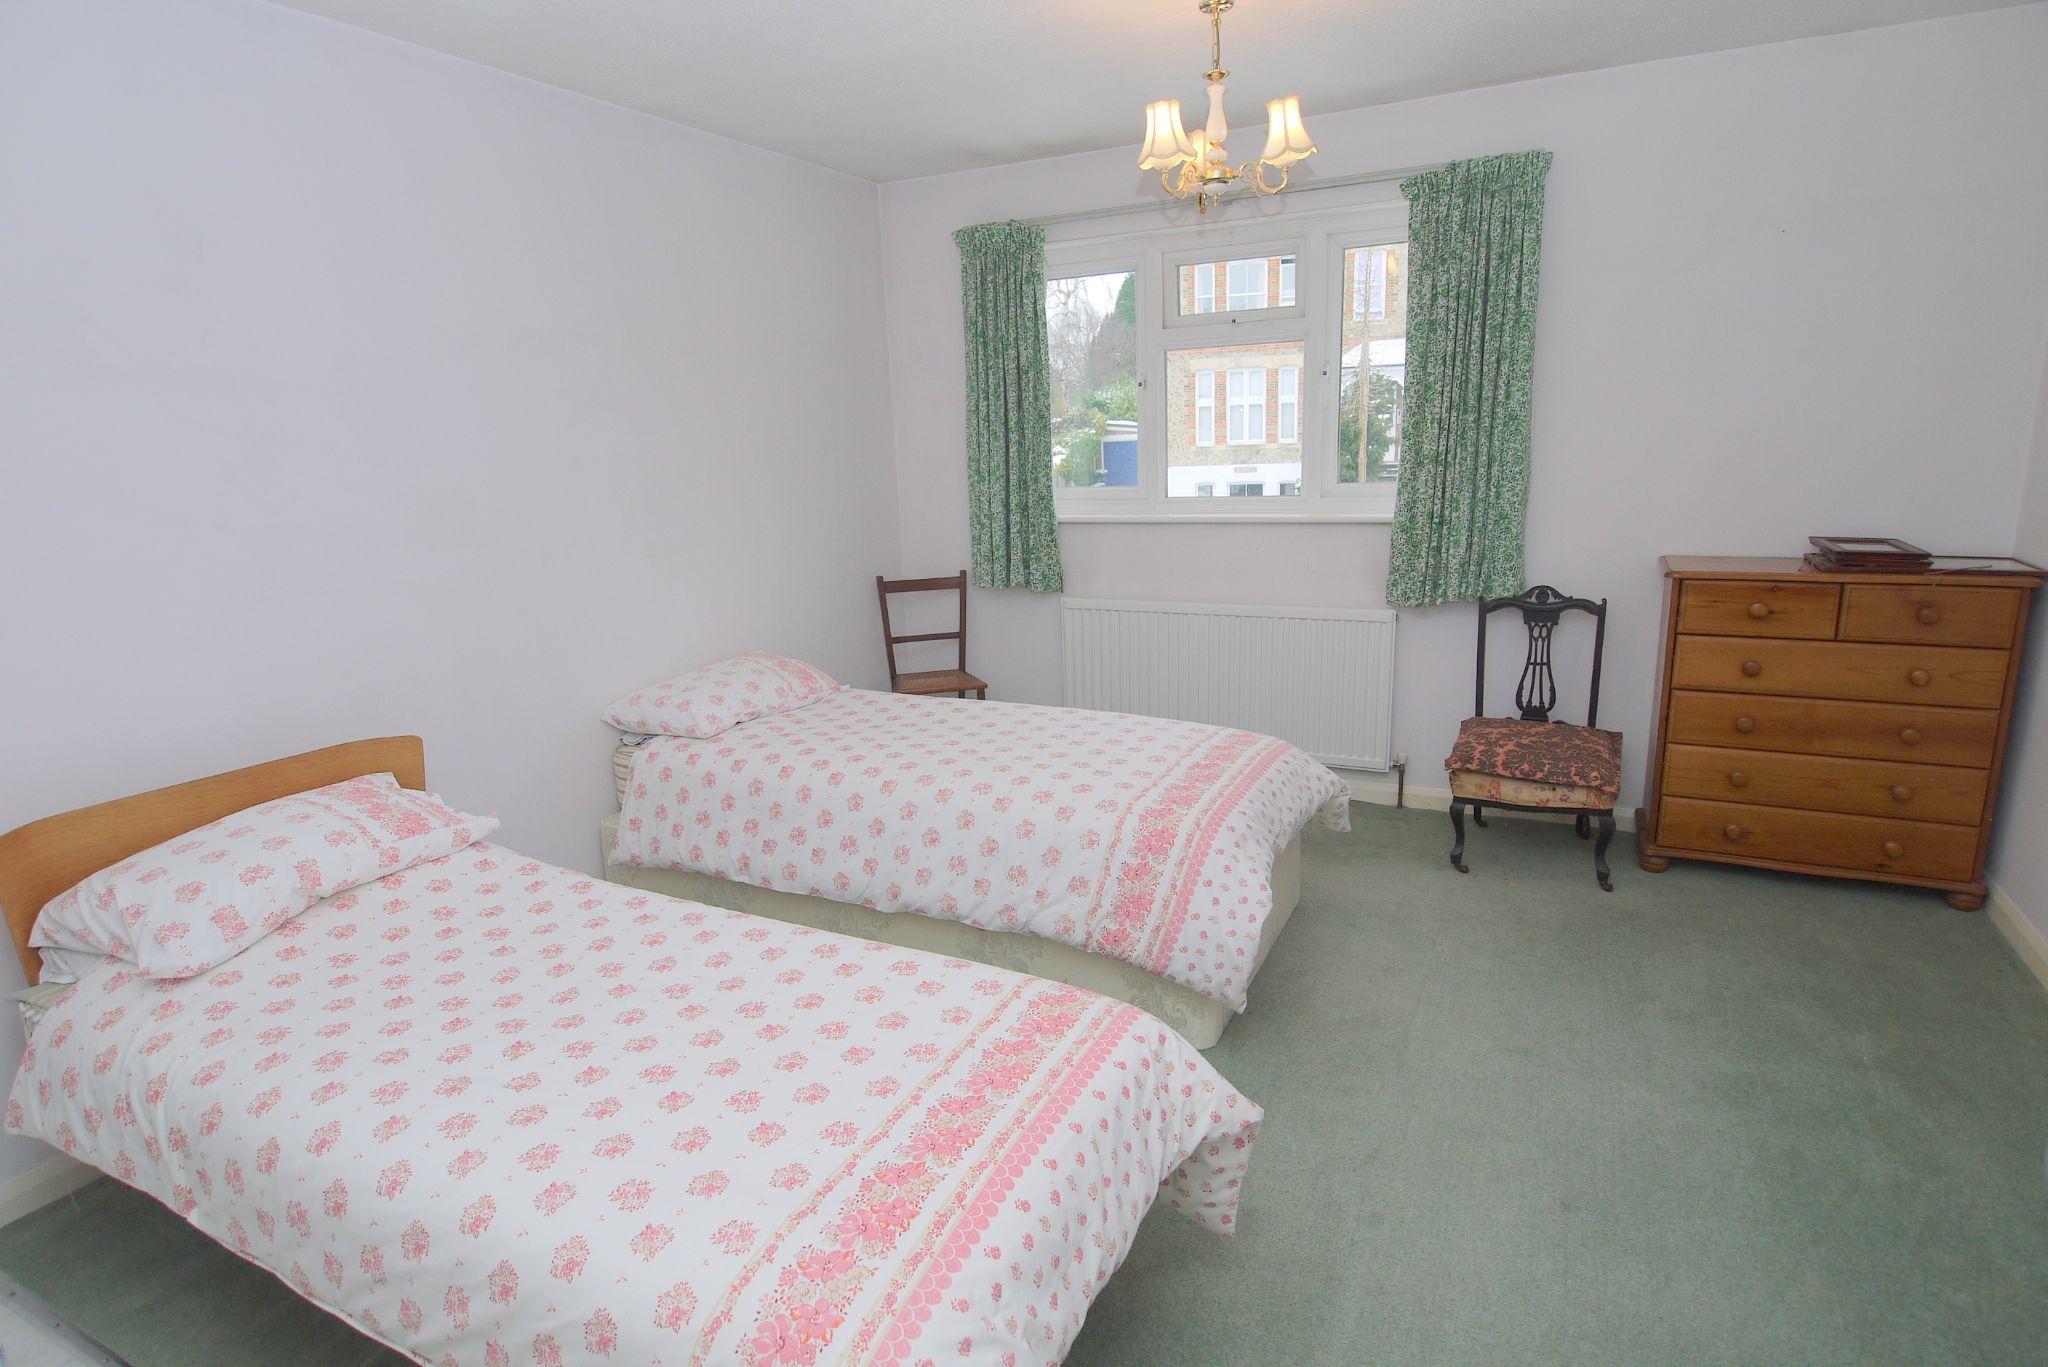 2 bedroom semi-detached house Sold in Sevenoaks - Photograph 4